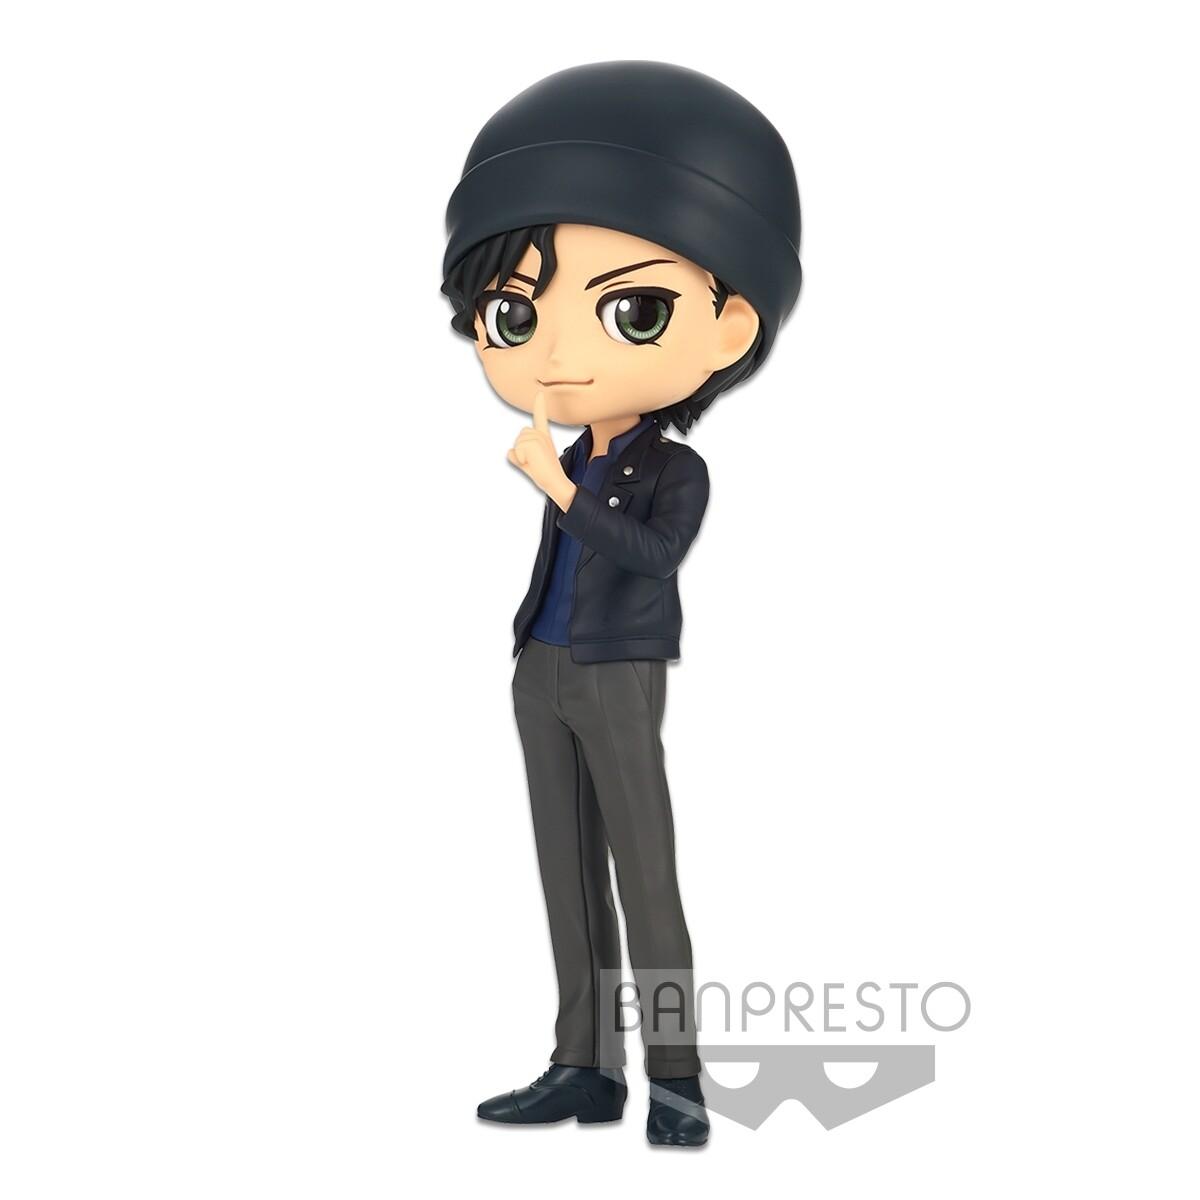 PRE-ORDER Banpresto Detective Conan Q Posket Shuichi Akai Ver. A